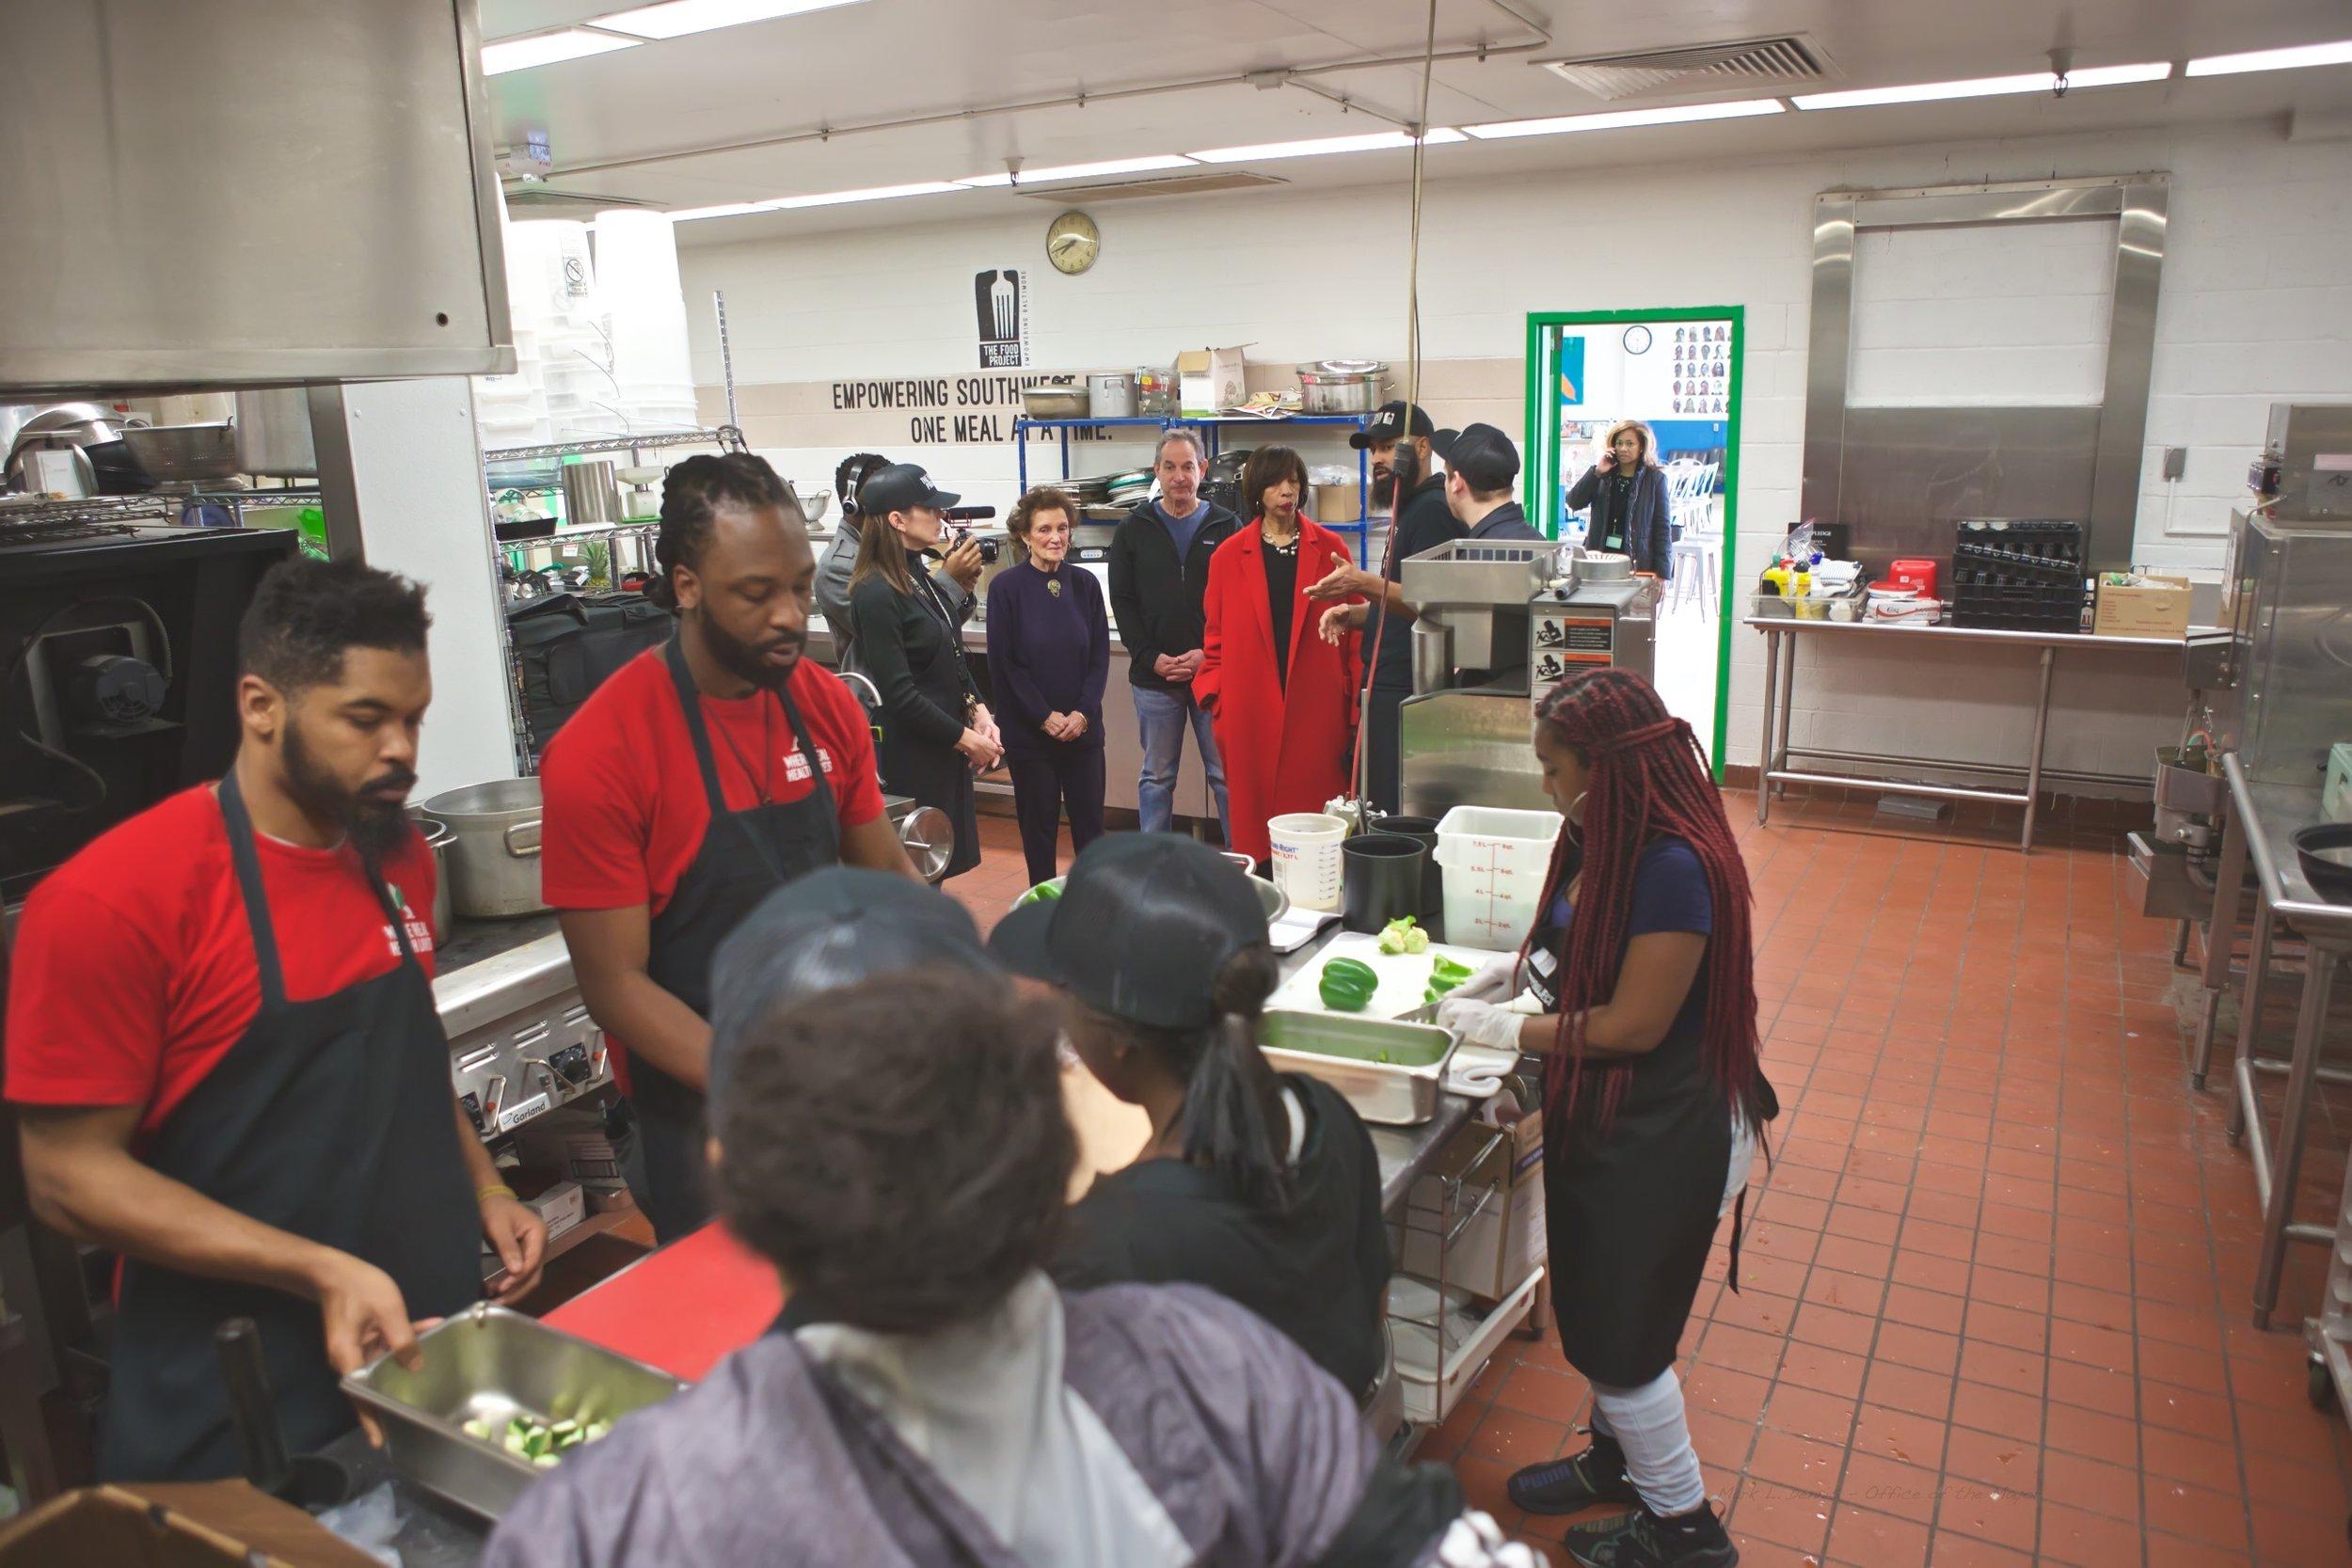 January 26, 2019 - Site visit to The Food Project, 424 S. Pulaski Street 2019-01-26 (6).jpg